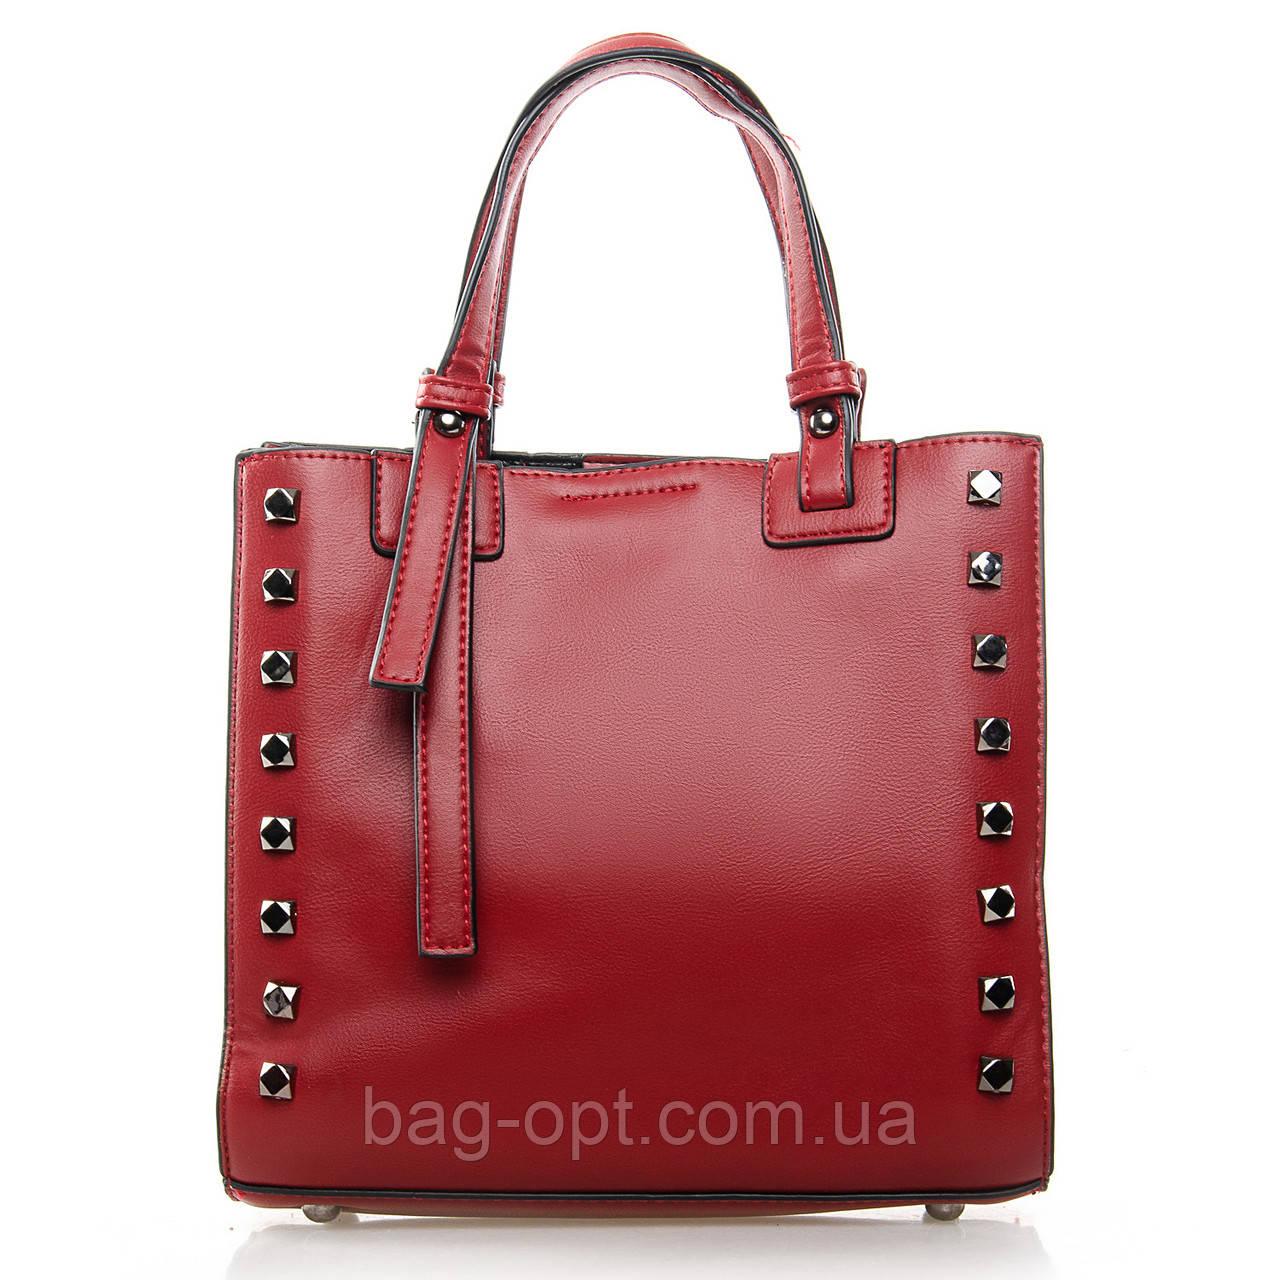 Женская сумка Charles & Keith (25x22*10 см) red